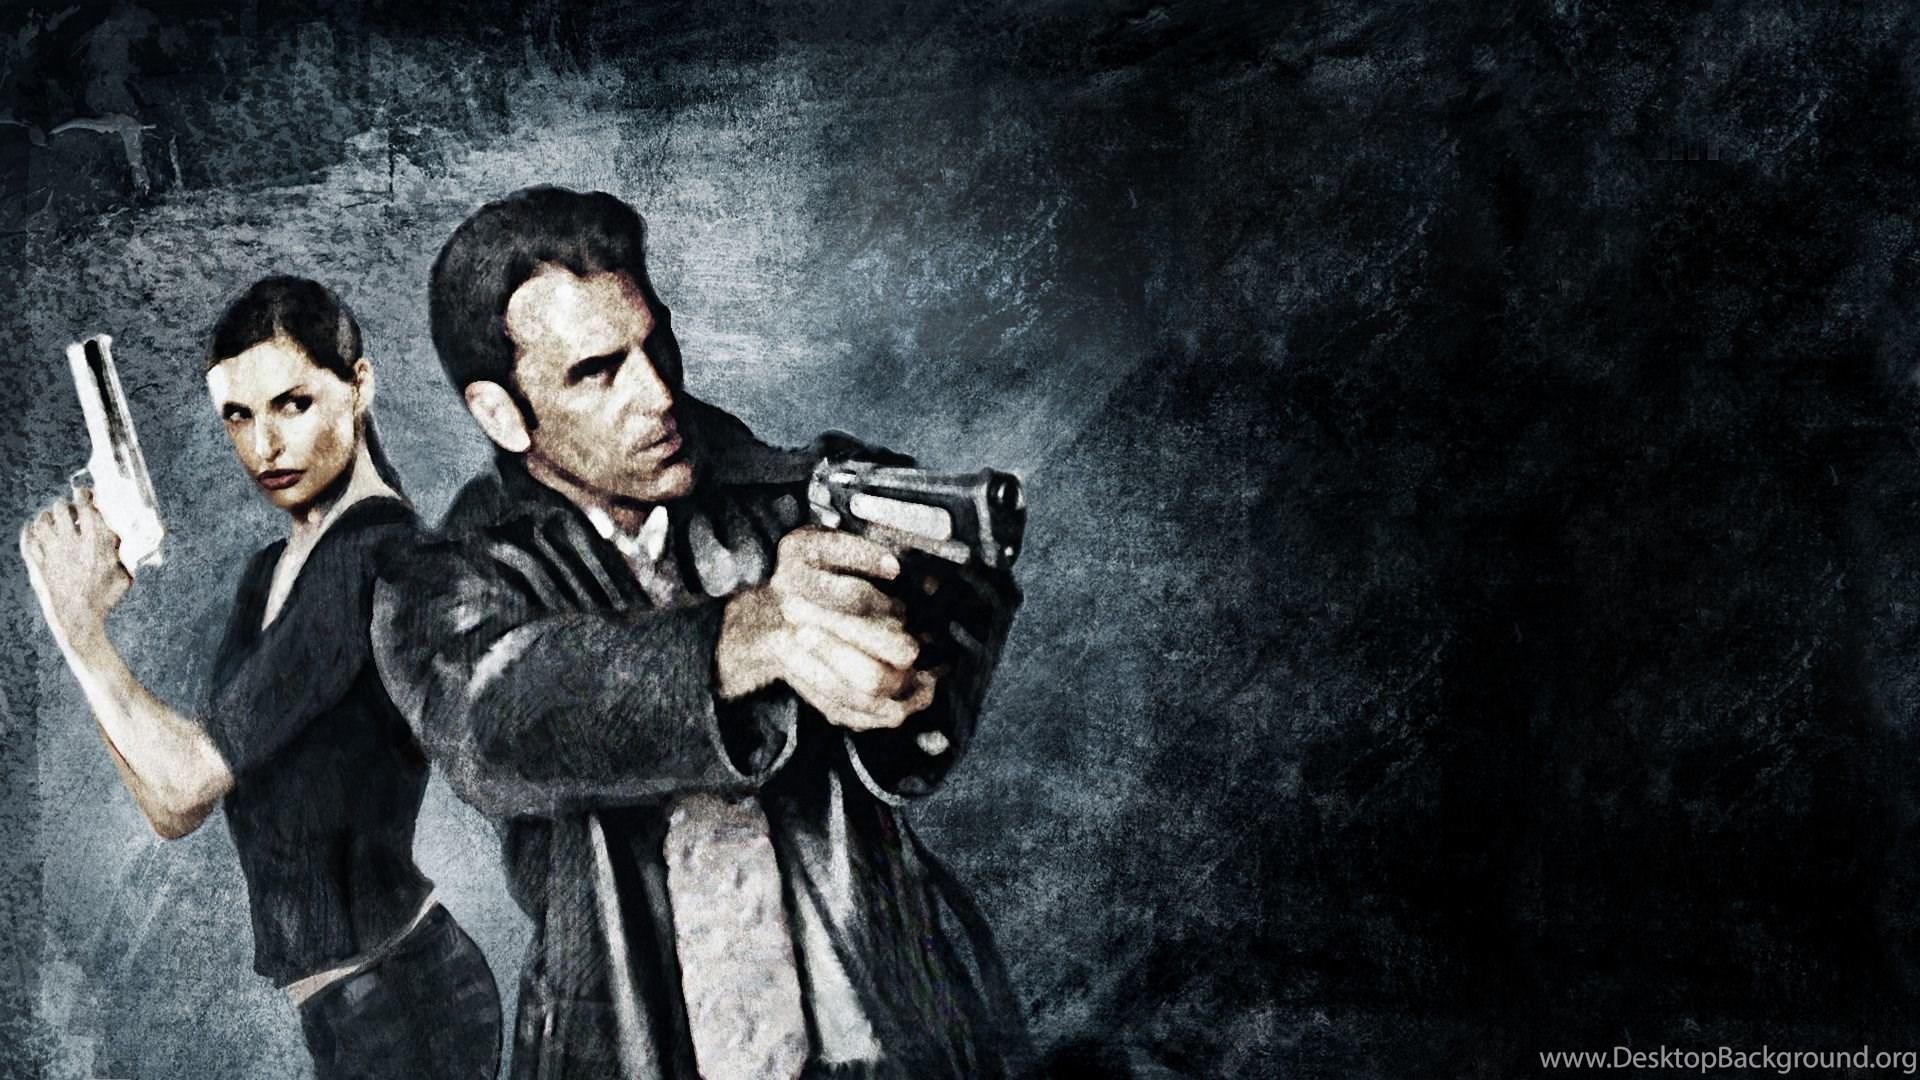 1. Max Payne 2: The Fall Of Max Payne